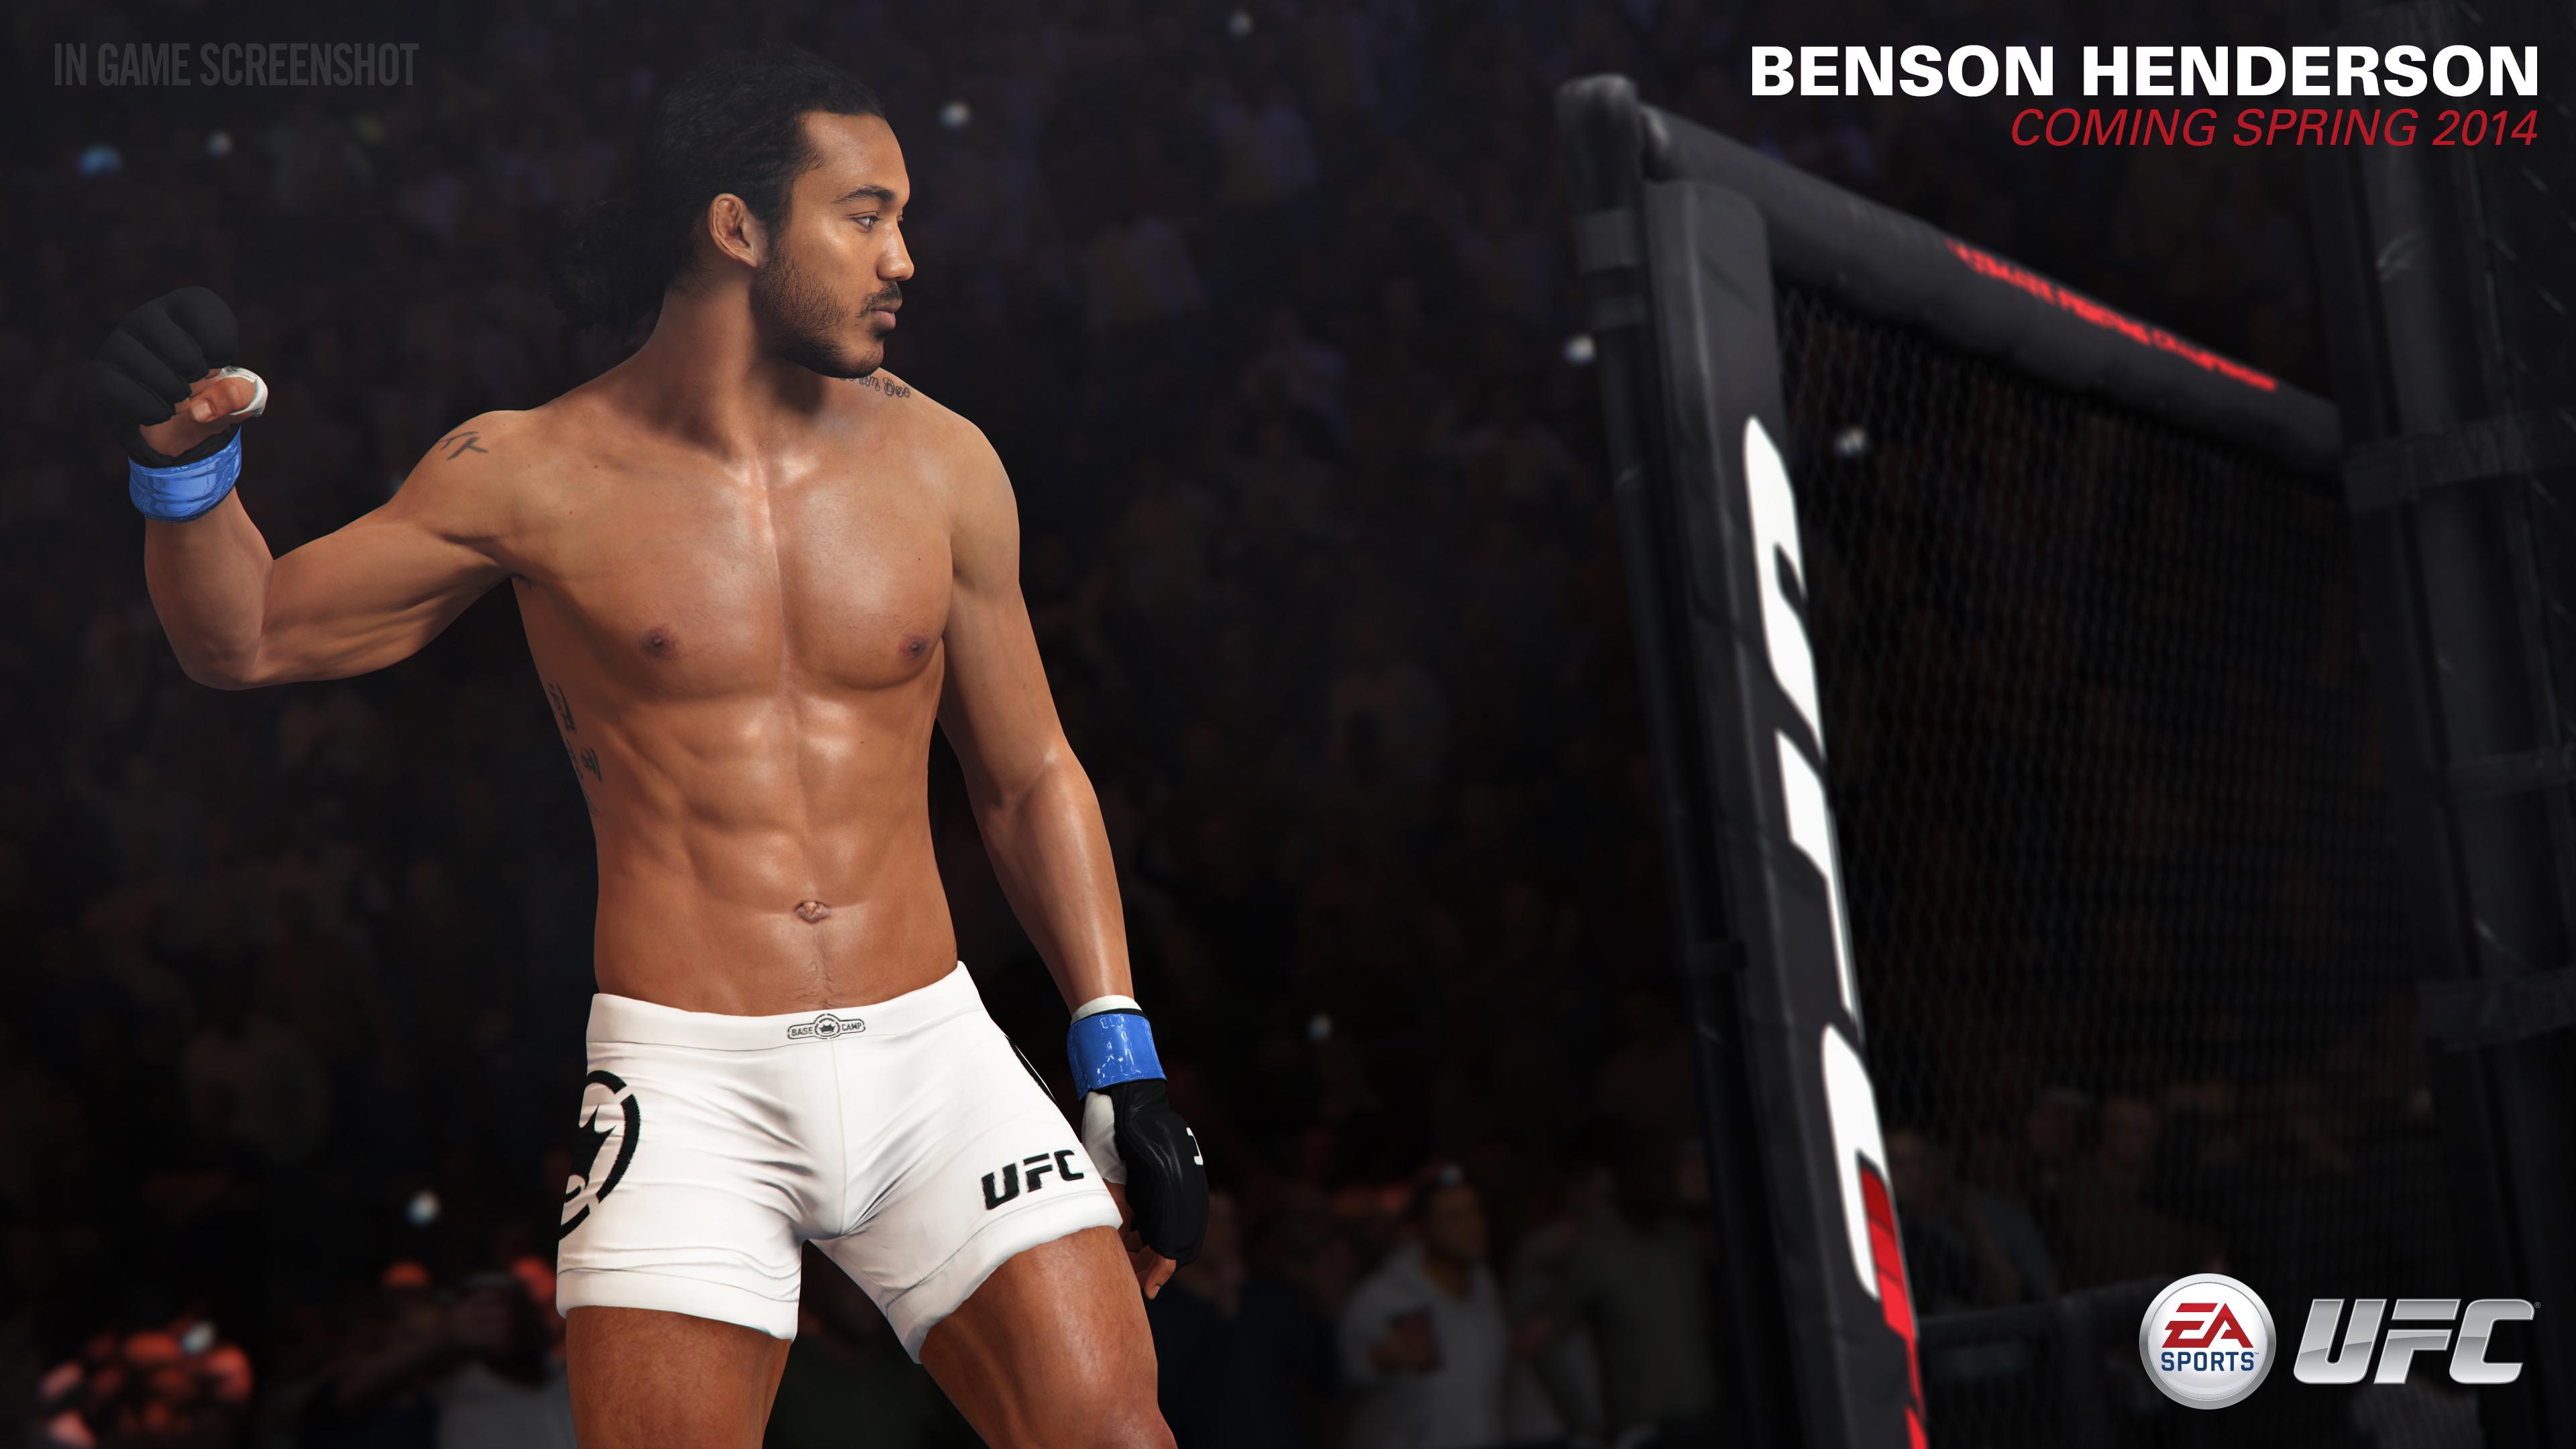 Бенсон Хендерсон - EA Sports UFC 4K